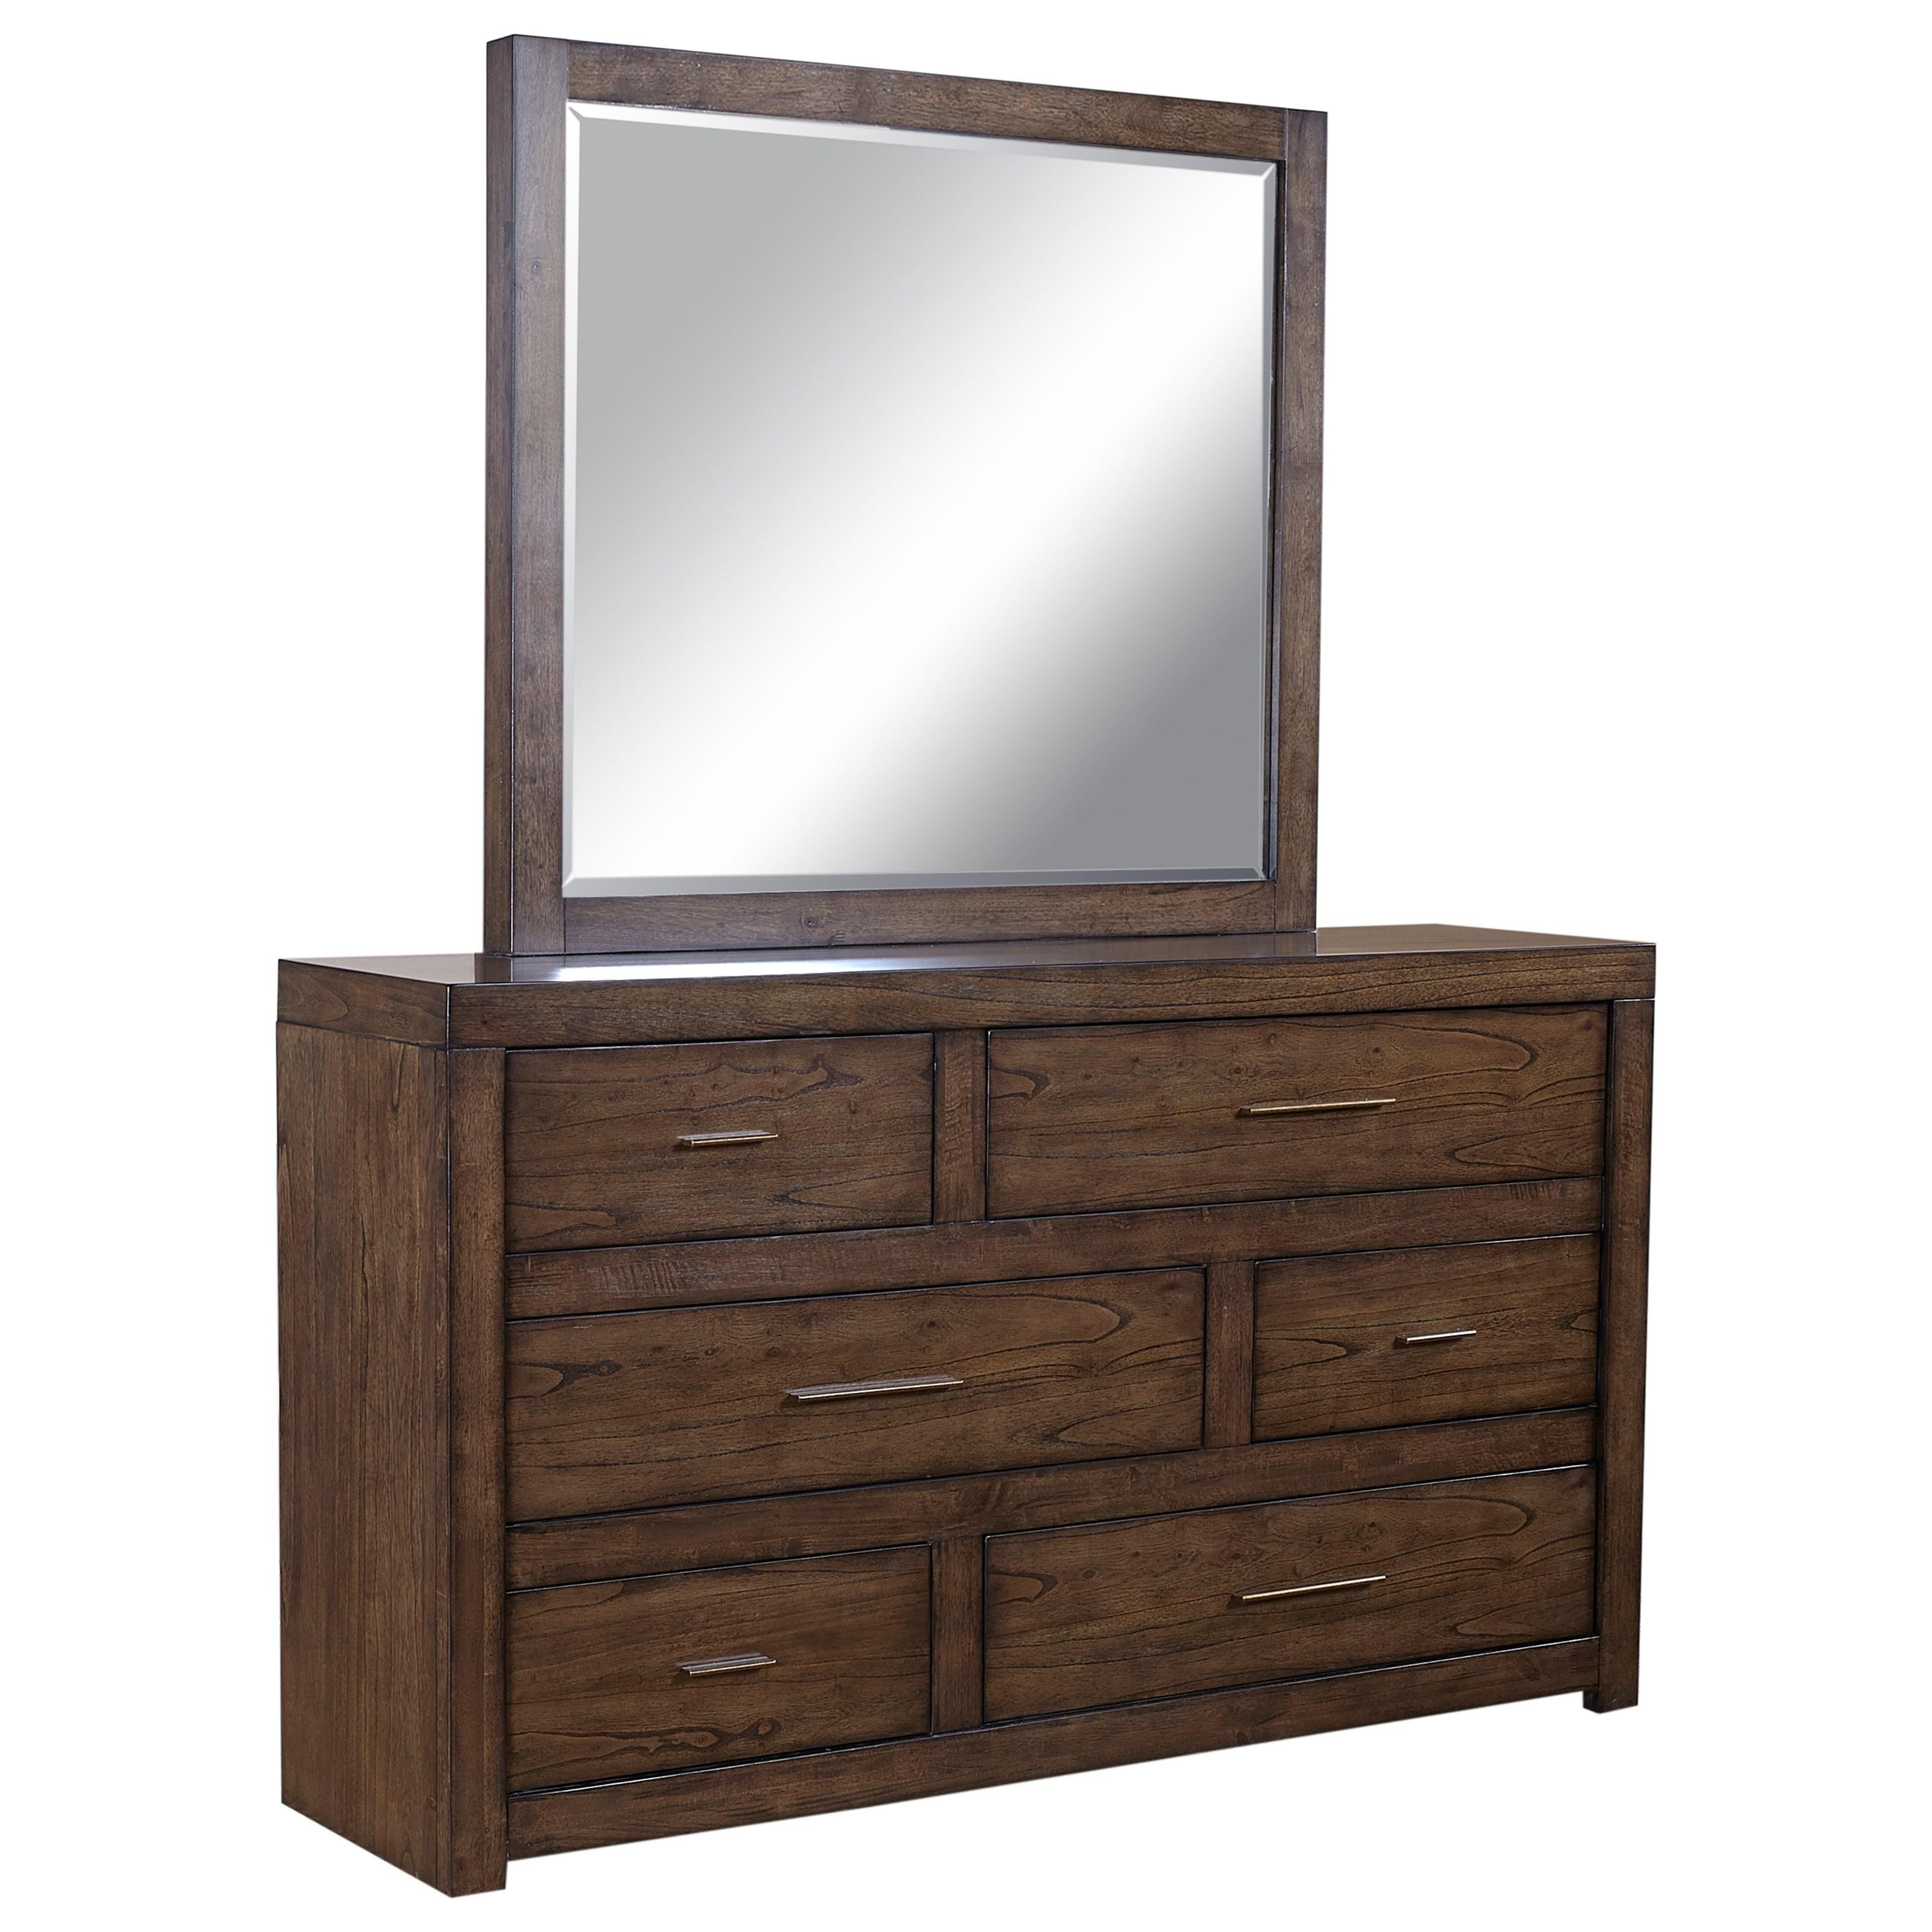 aspenhome modern loft asymmetrical dresser and mirror set belfort furniture dresser mirror. Black Bedroom Furniture Sets. Home Design Ideas